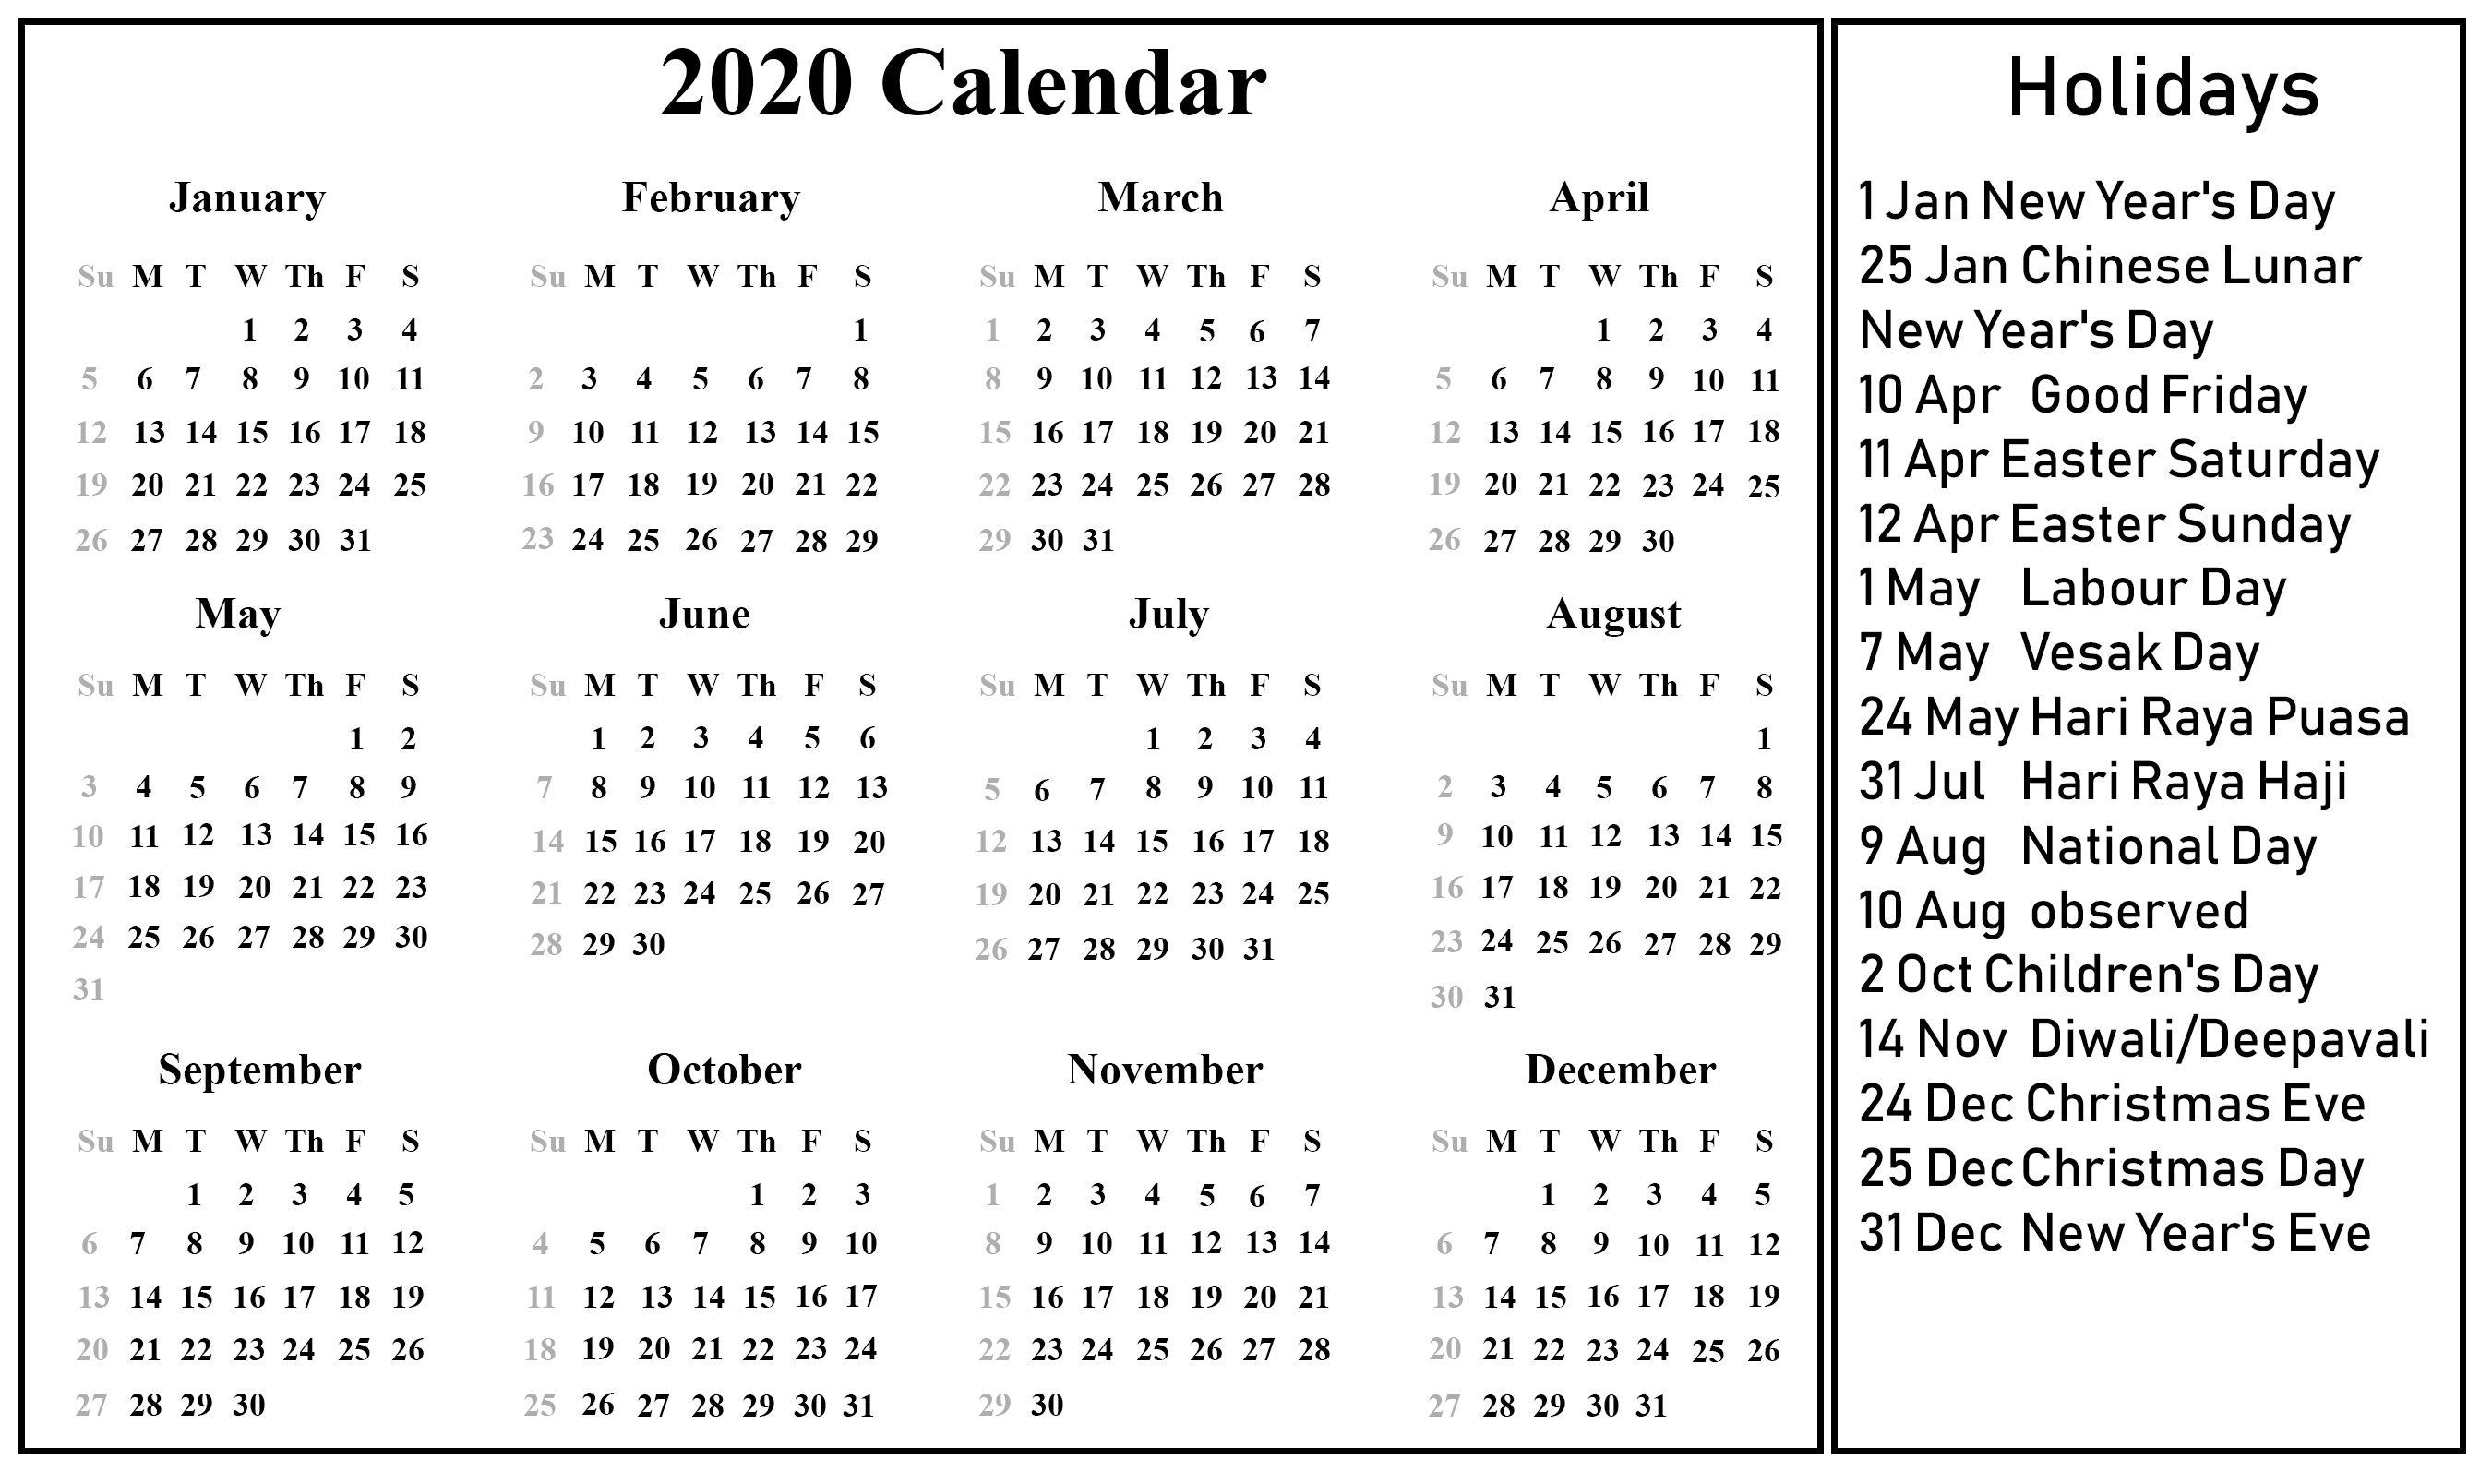 Impressive 2020 Calendar Holidays Sri Lanka In 2020 Holiday Calendar Printable Holiday Calendar Printable Calendar Template